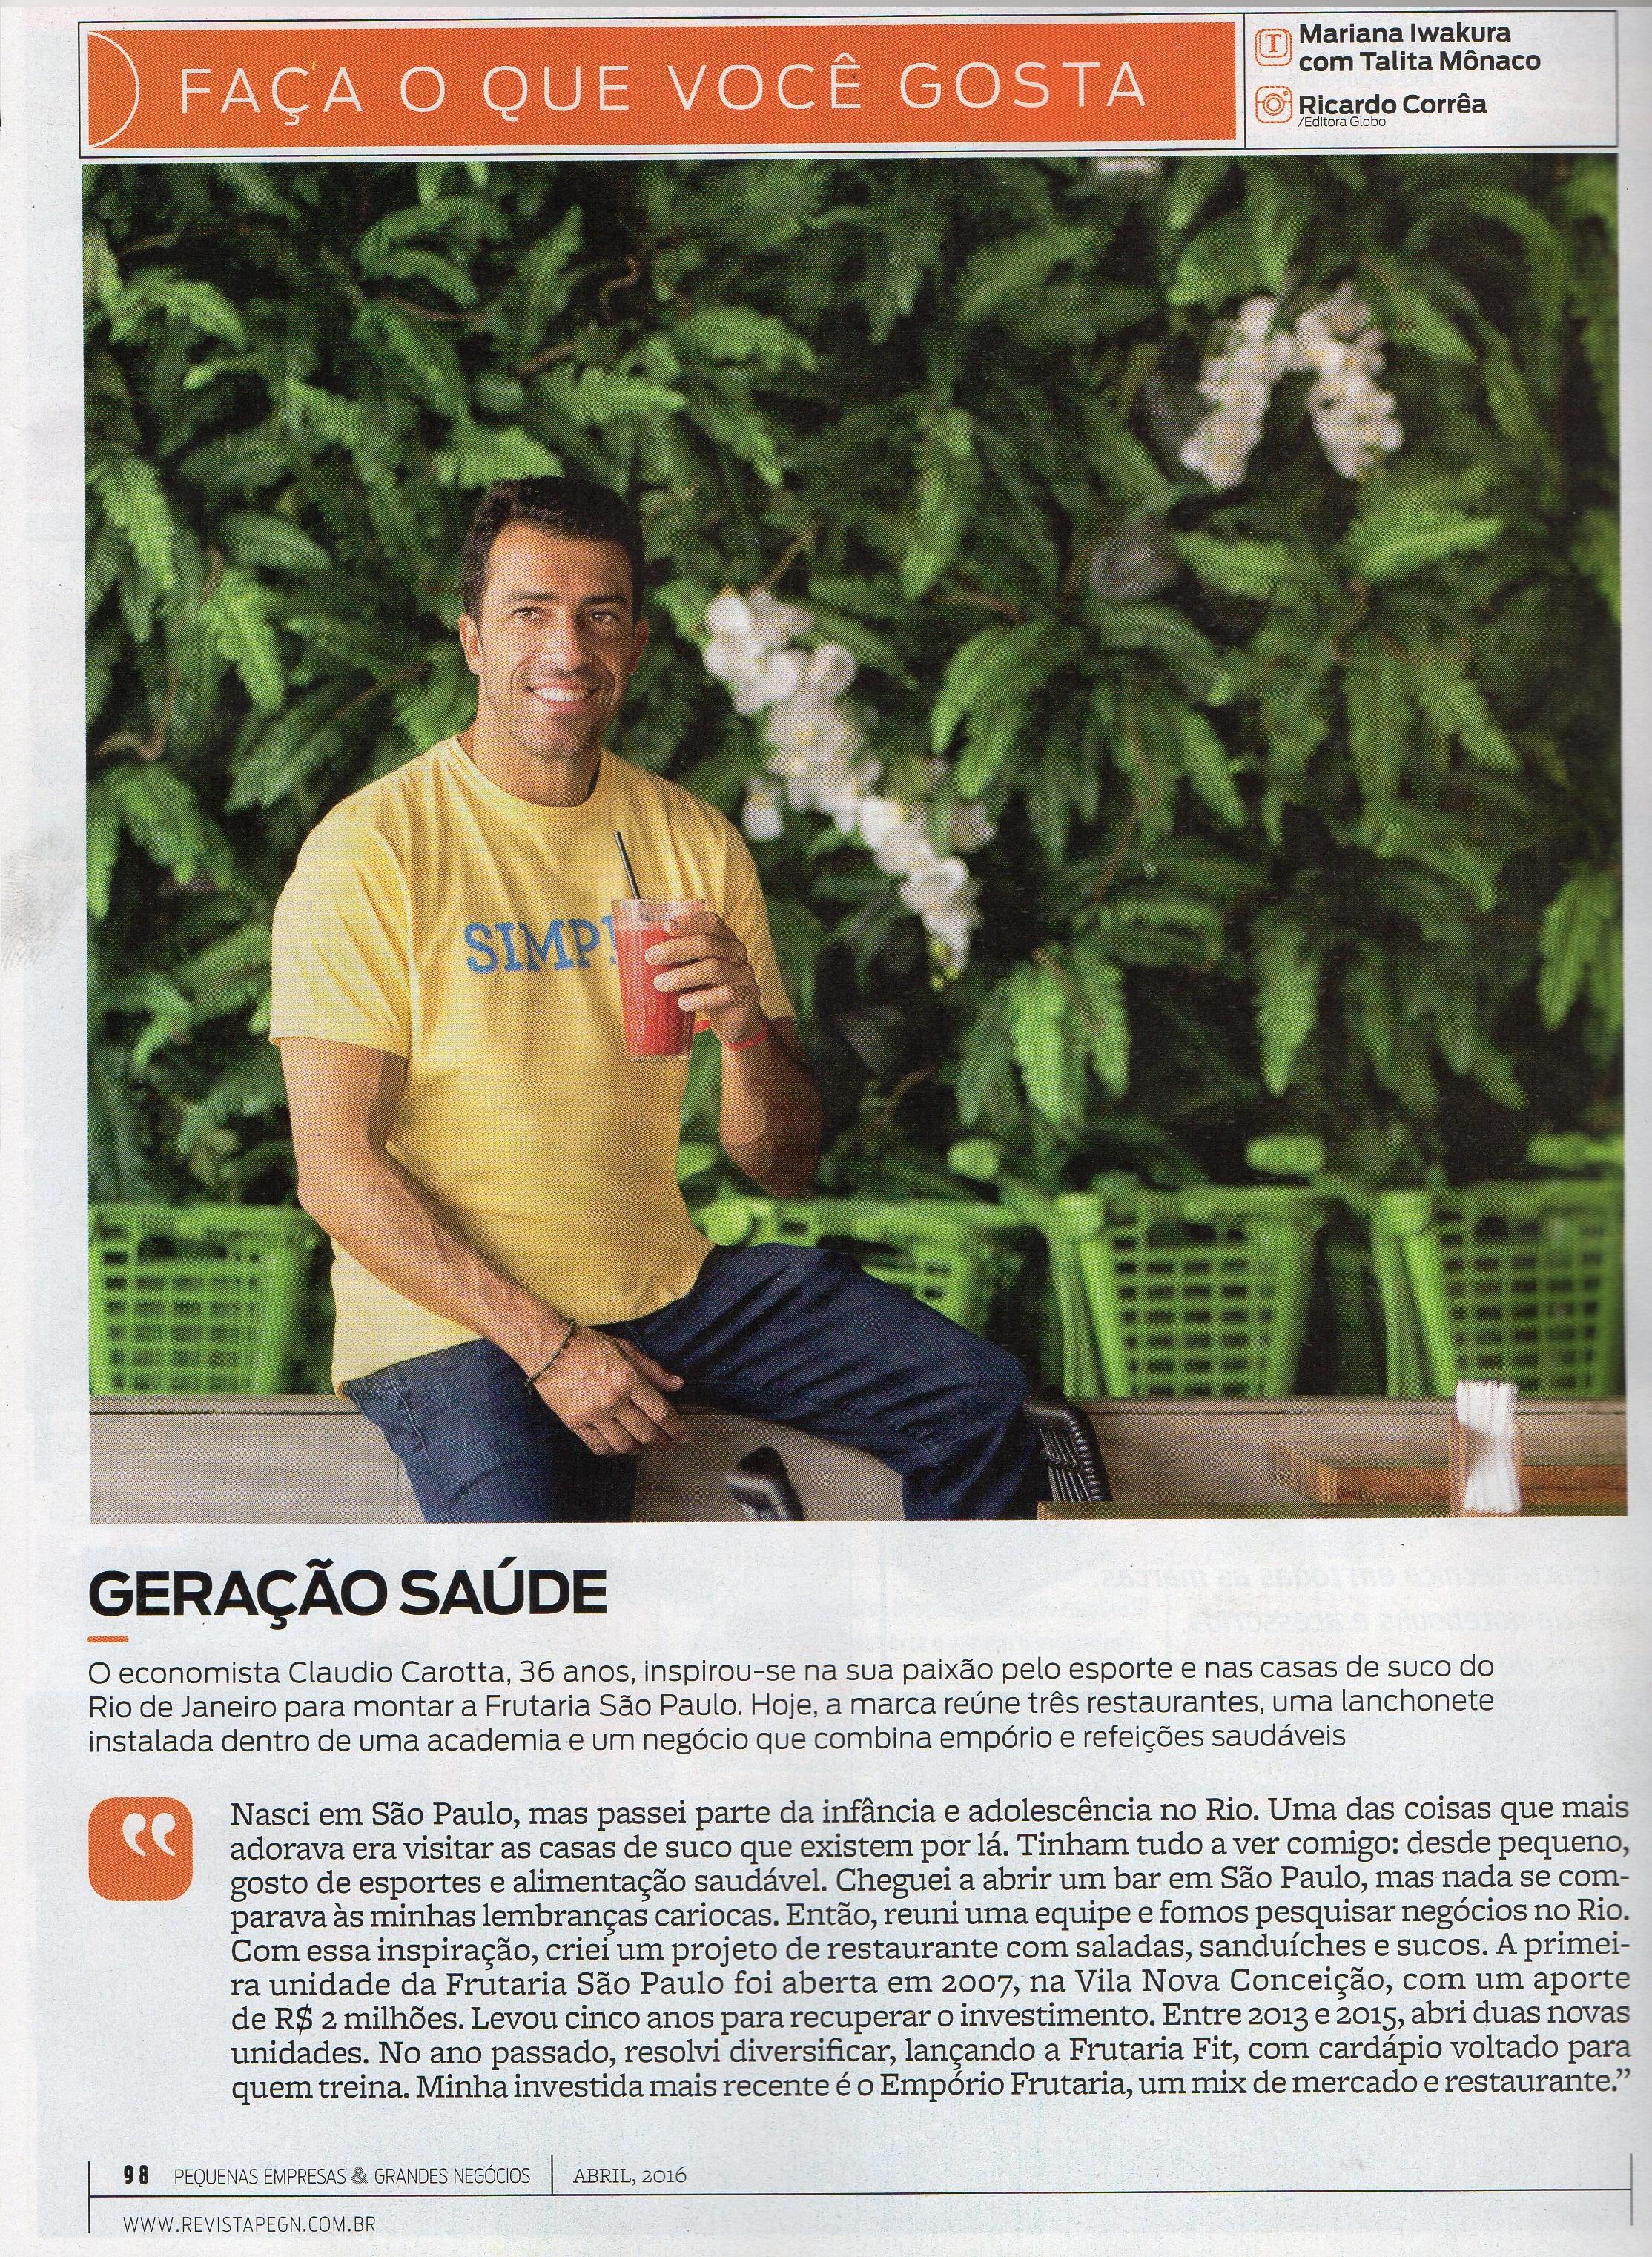 Pequenas Empresas Grandes Negócios Empório Frutaria 08 De Abril De 2016